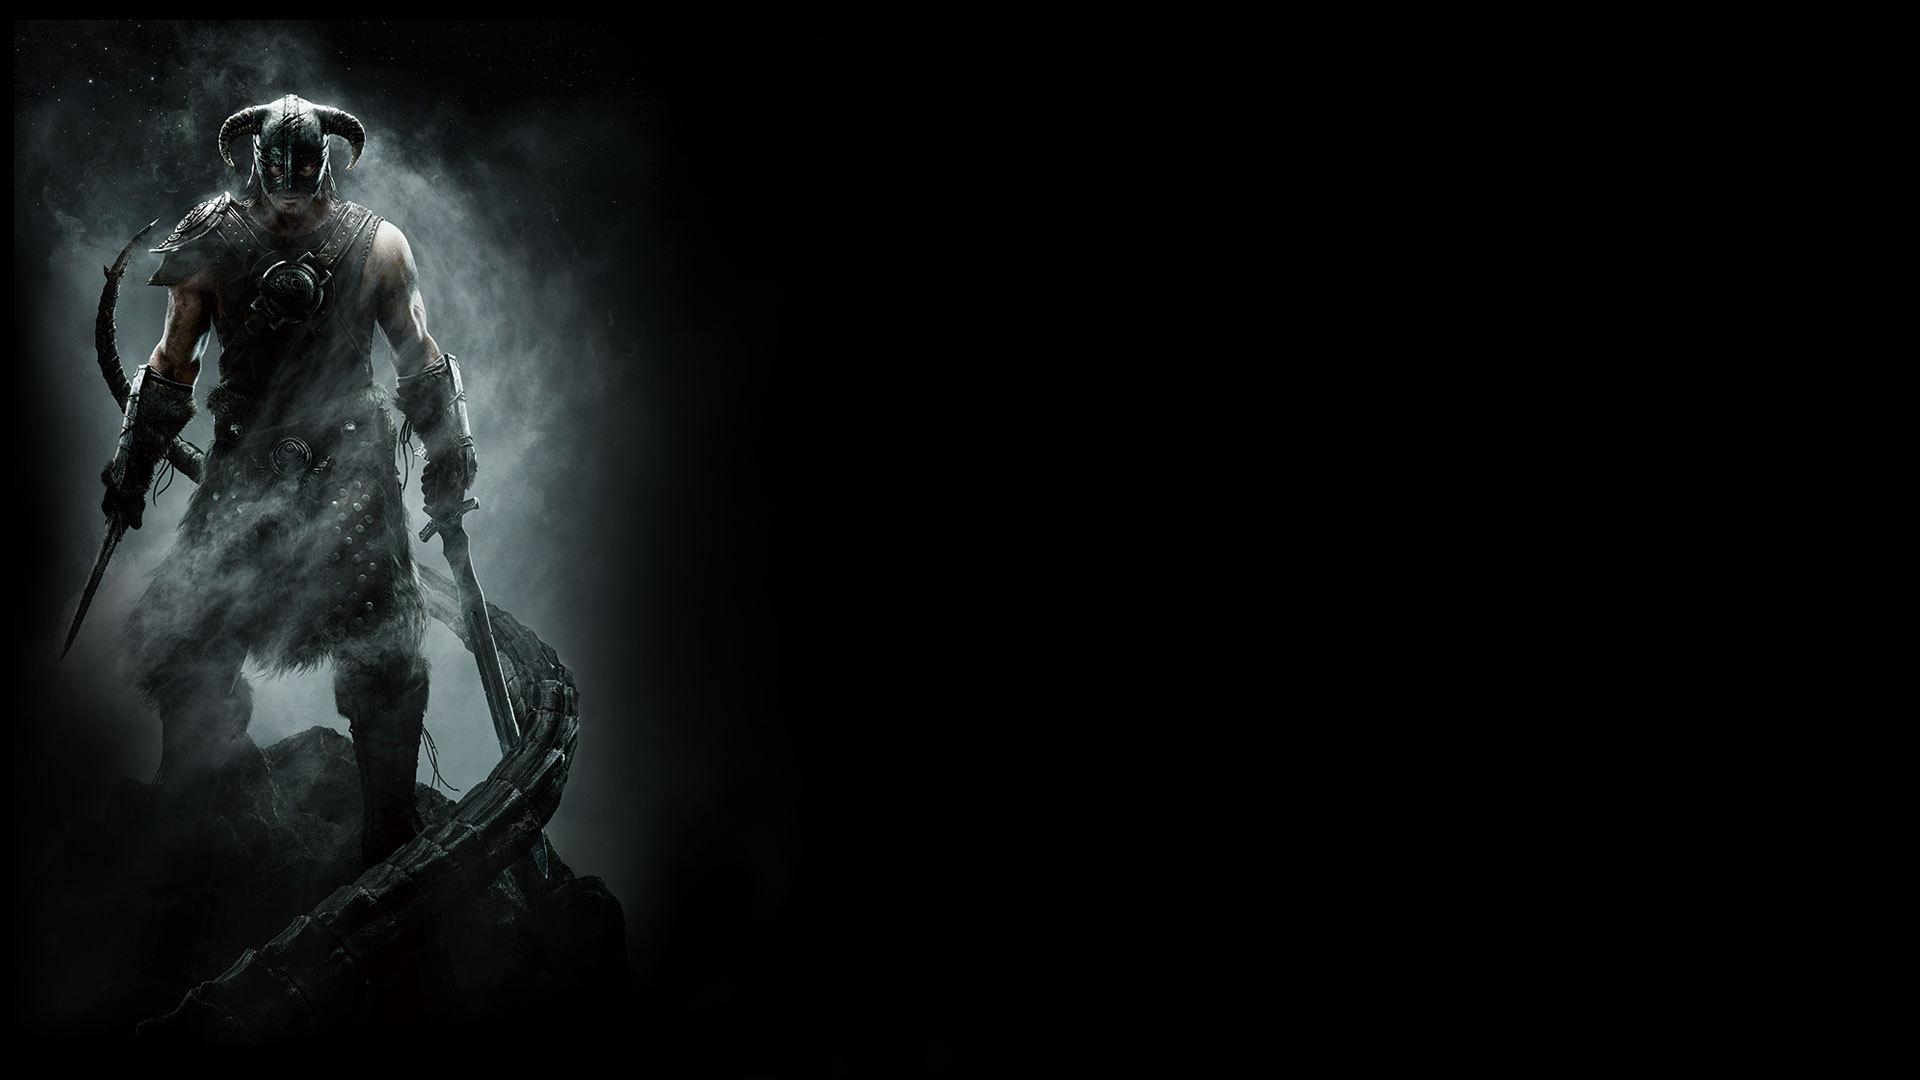 dragon blade download full movie